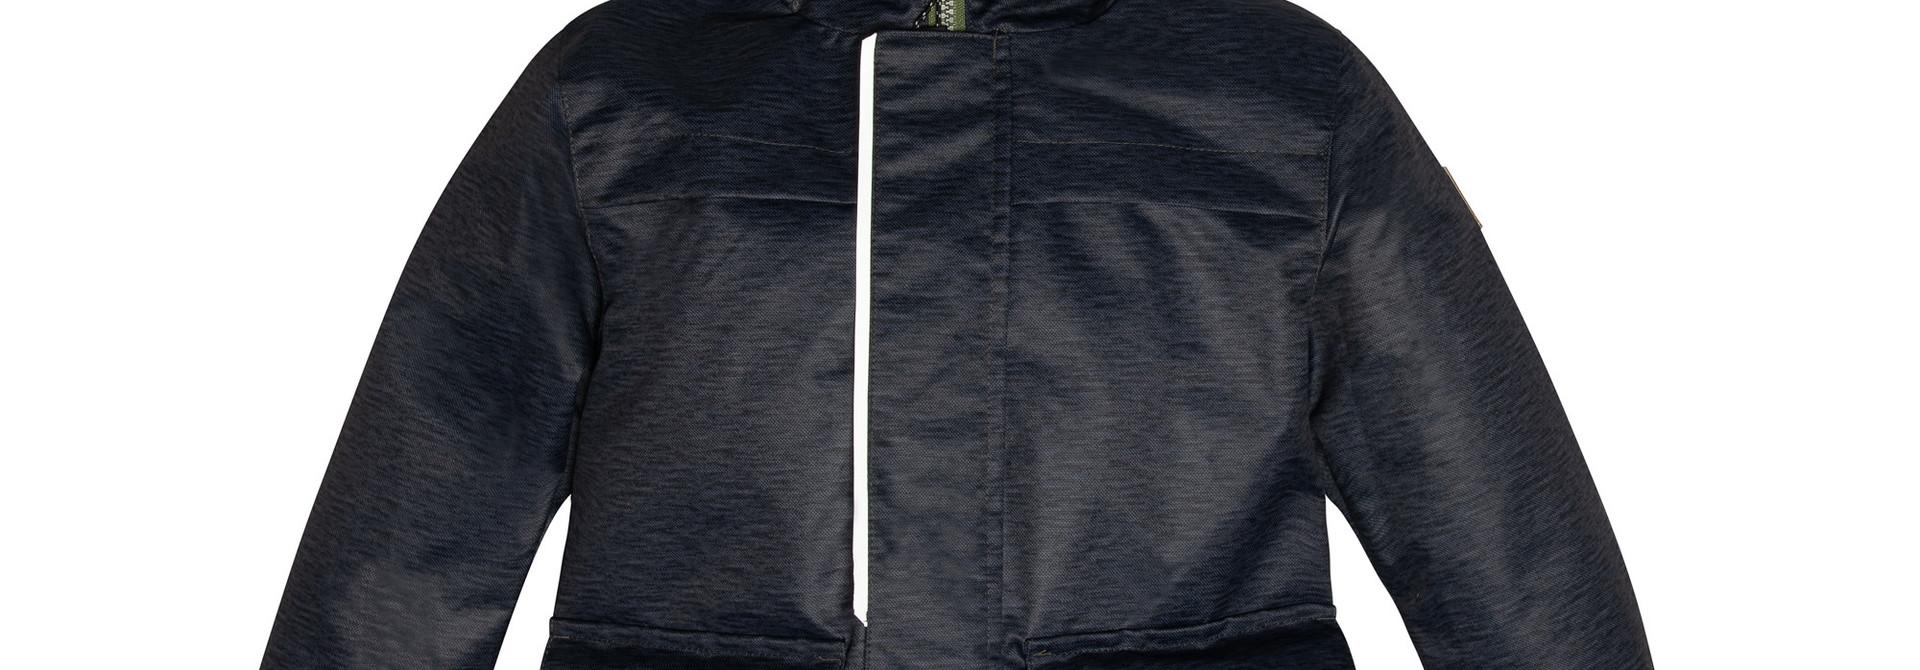 Manteau de pluie - Noir camo